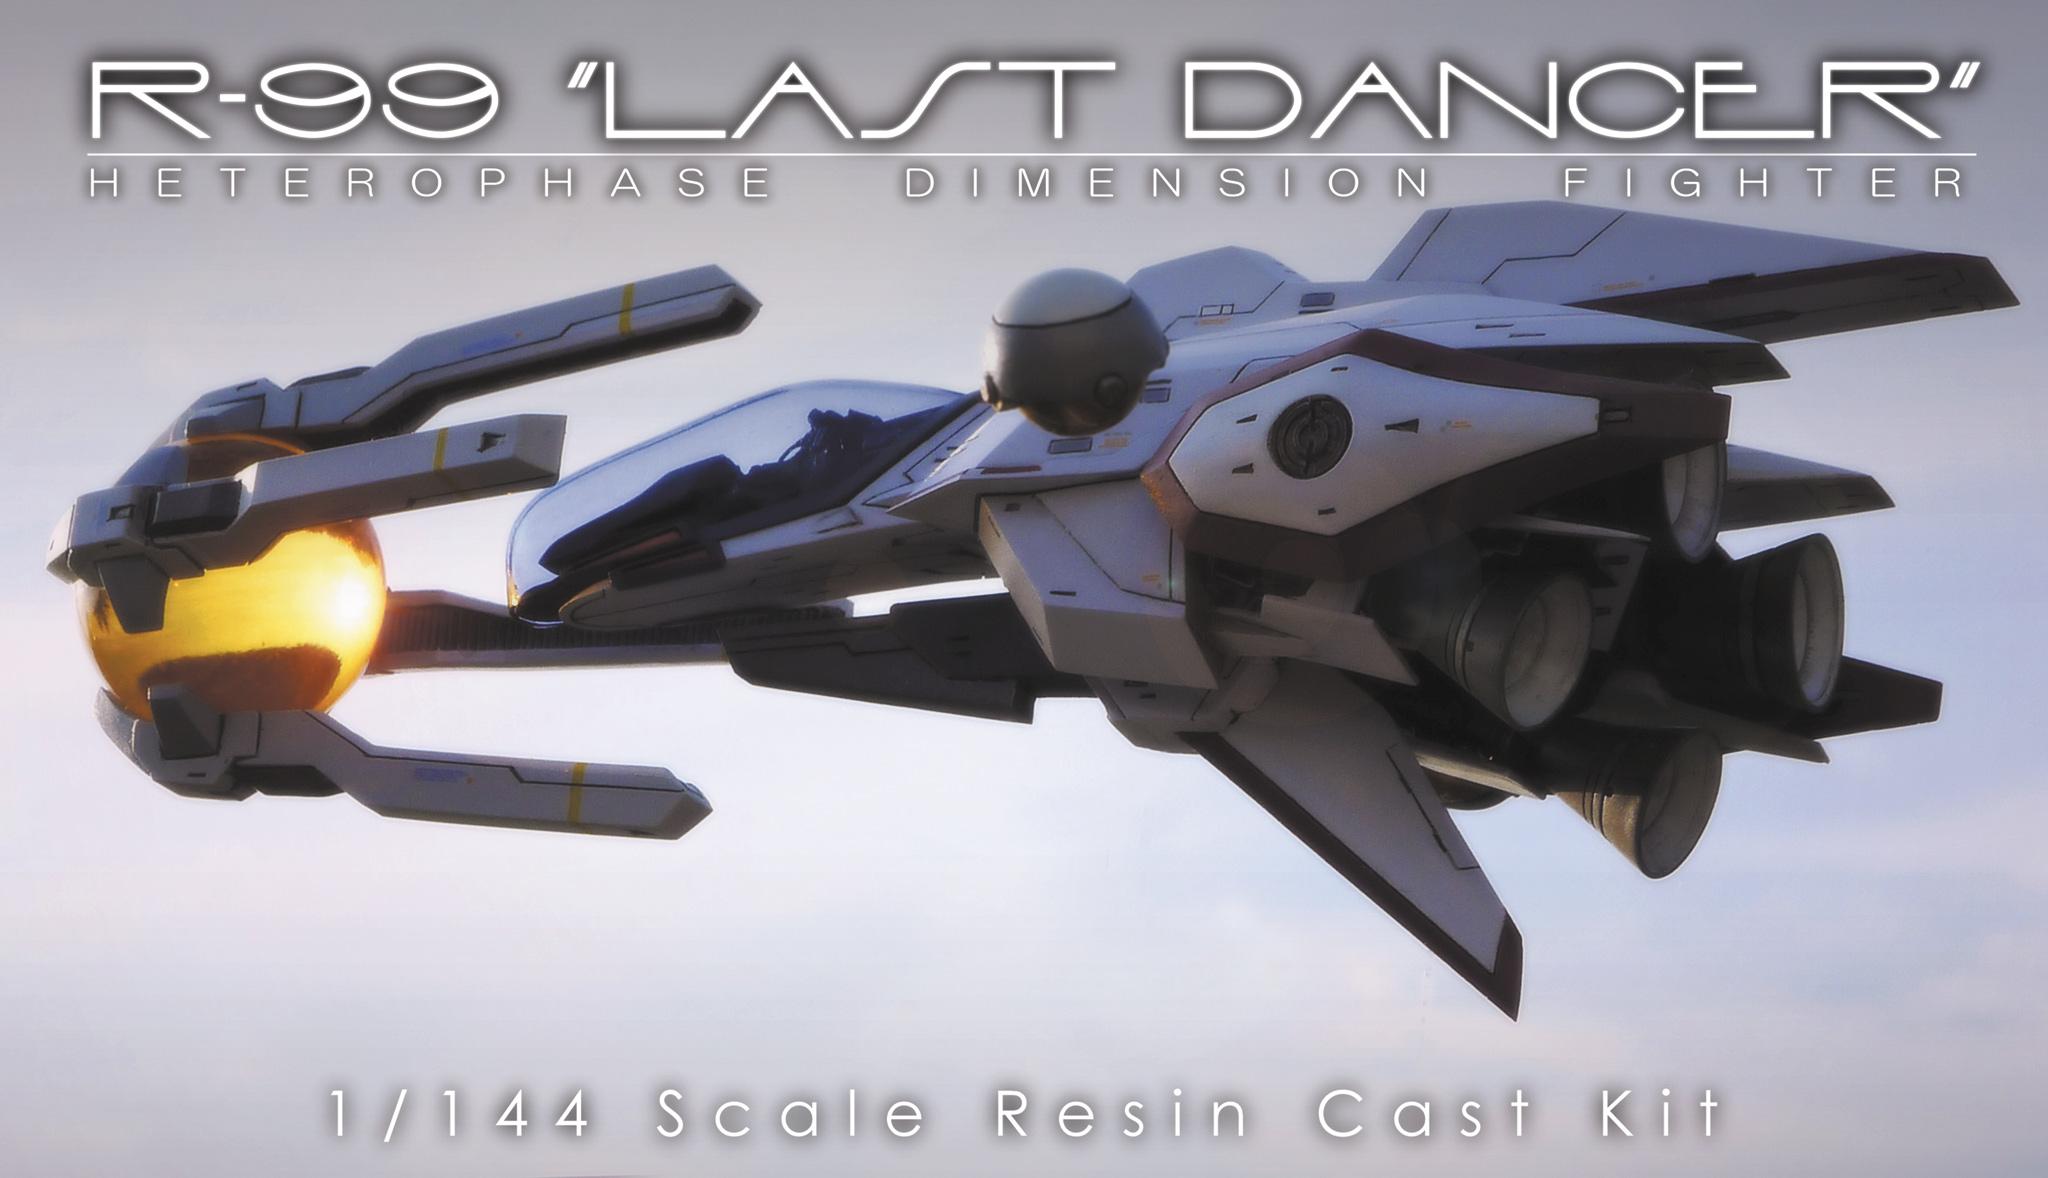 R-99 Last-Dancer